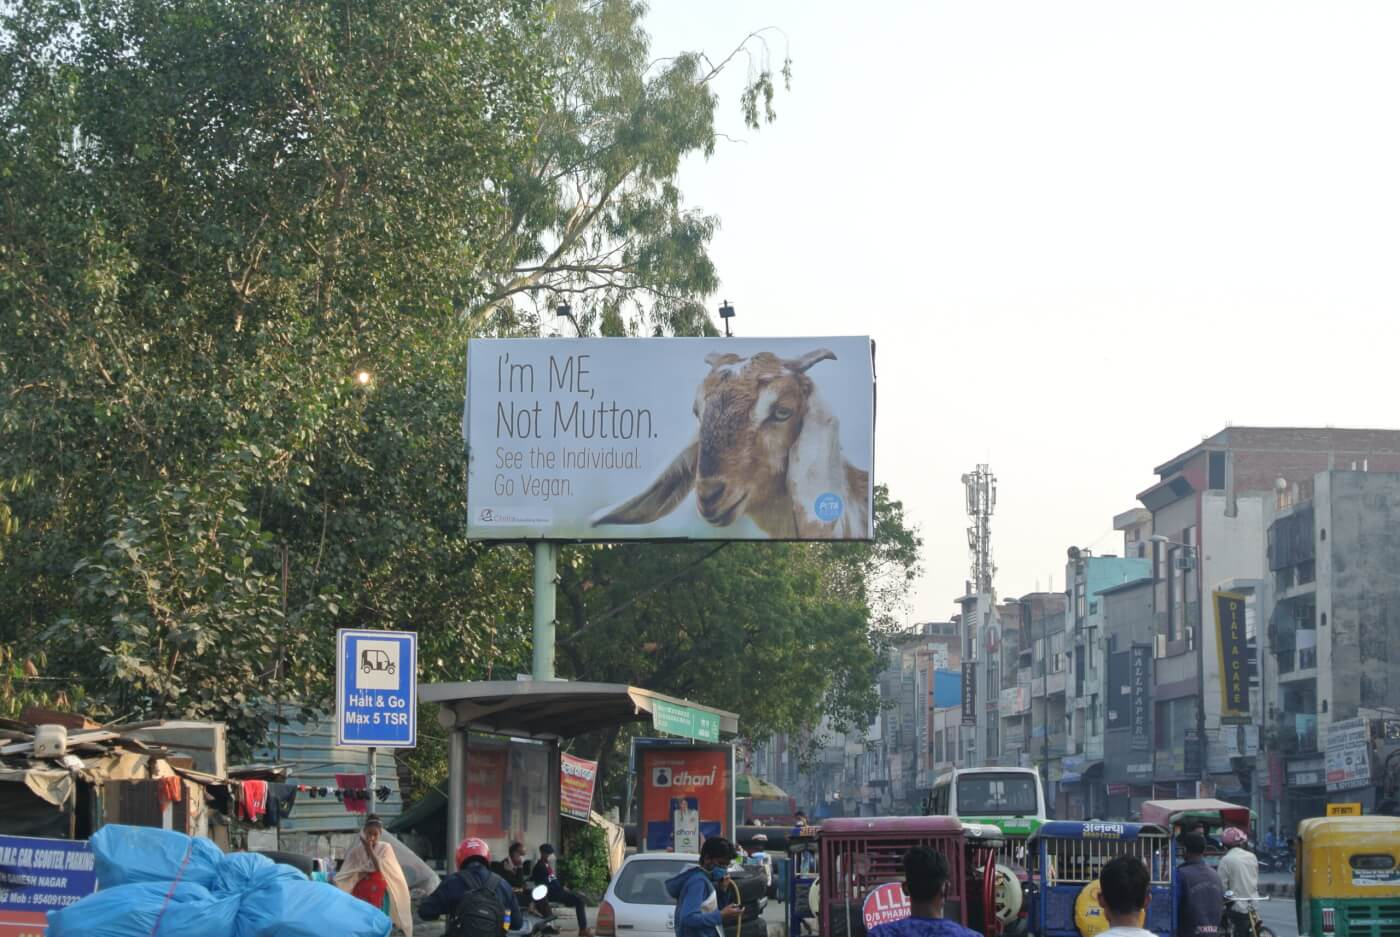 goat patparganj rd delhi i'm me not meat